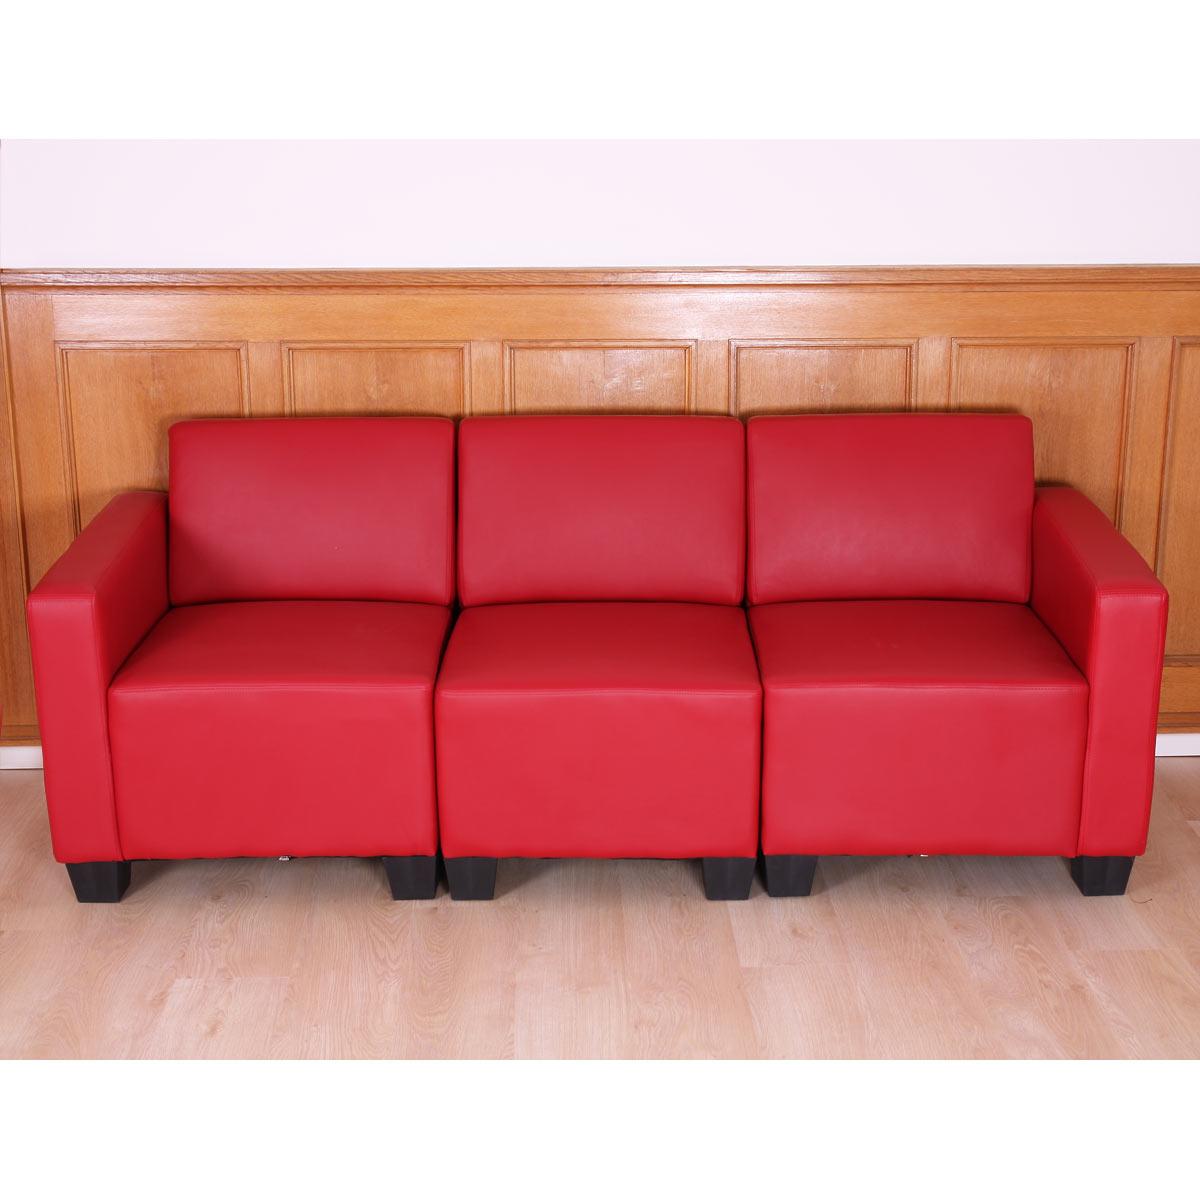 Modular 3 Sitzer Sofa Couch Lyon Kunstleder Schwarz Creme Rot Ebay